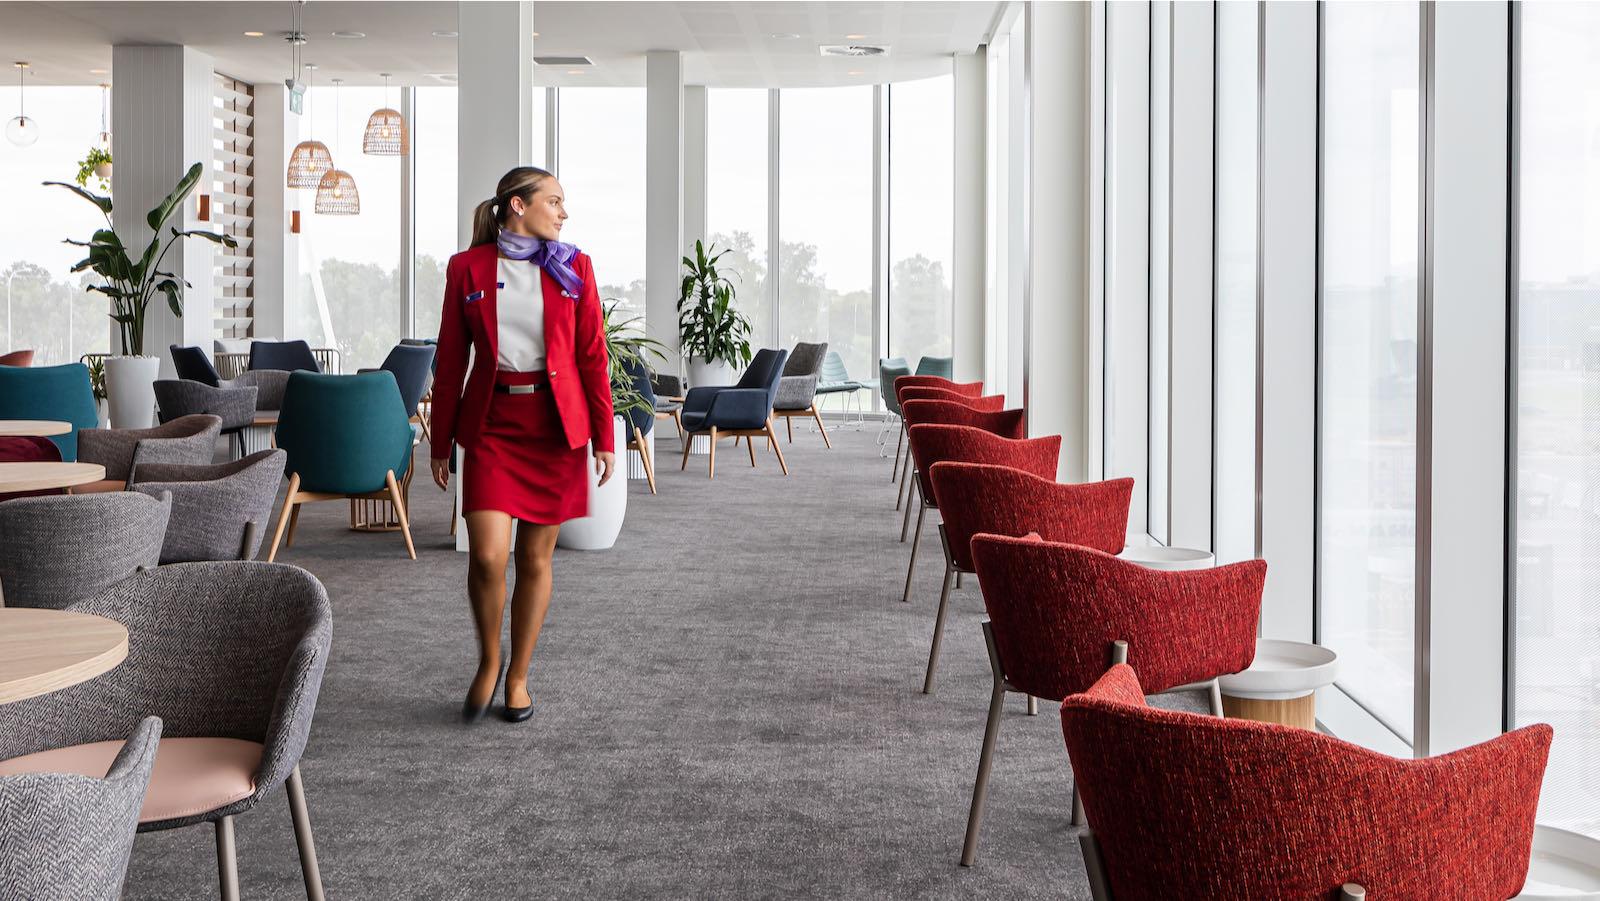 Virgin Australia Adelaide Lounge The Long Stay